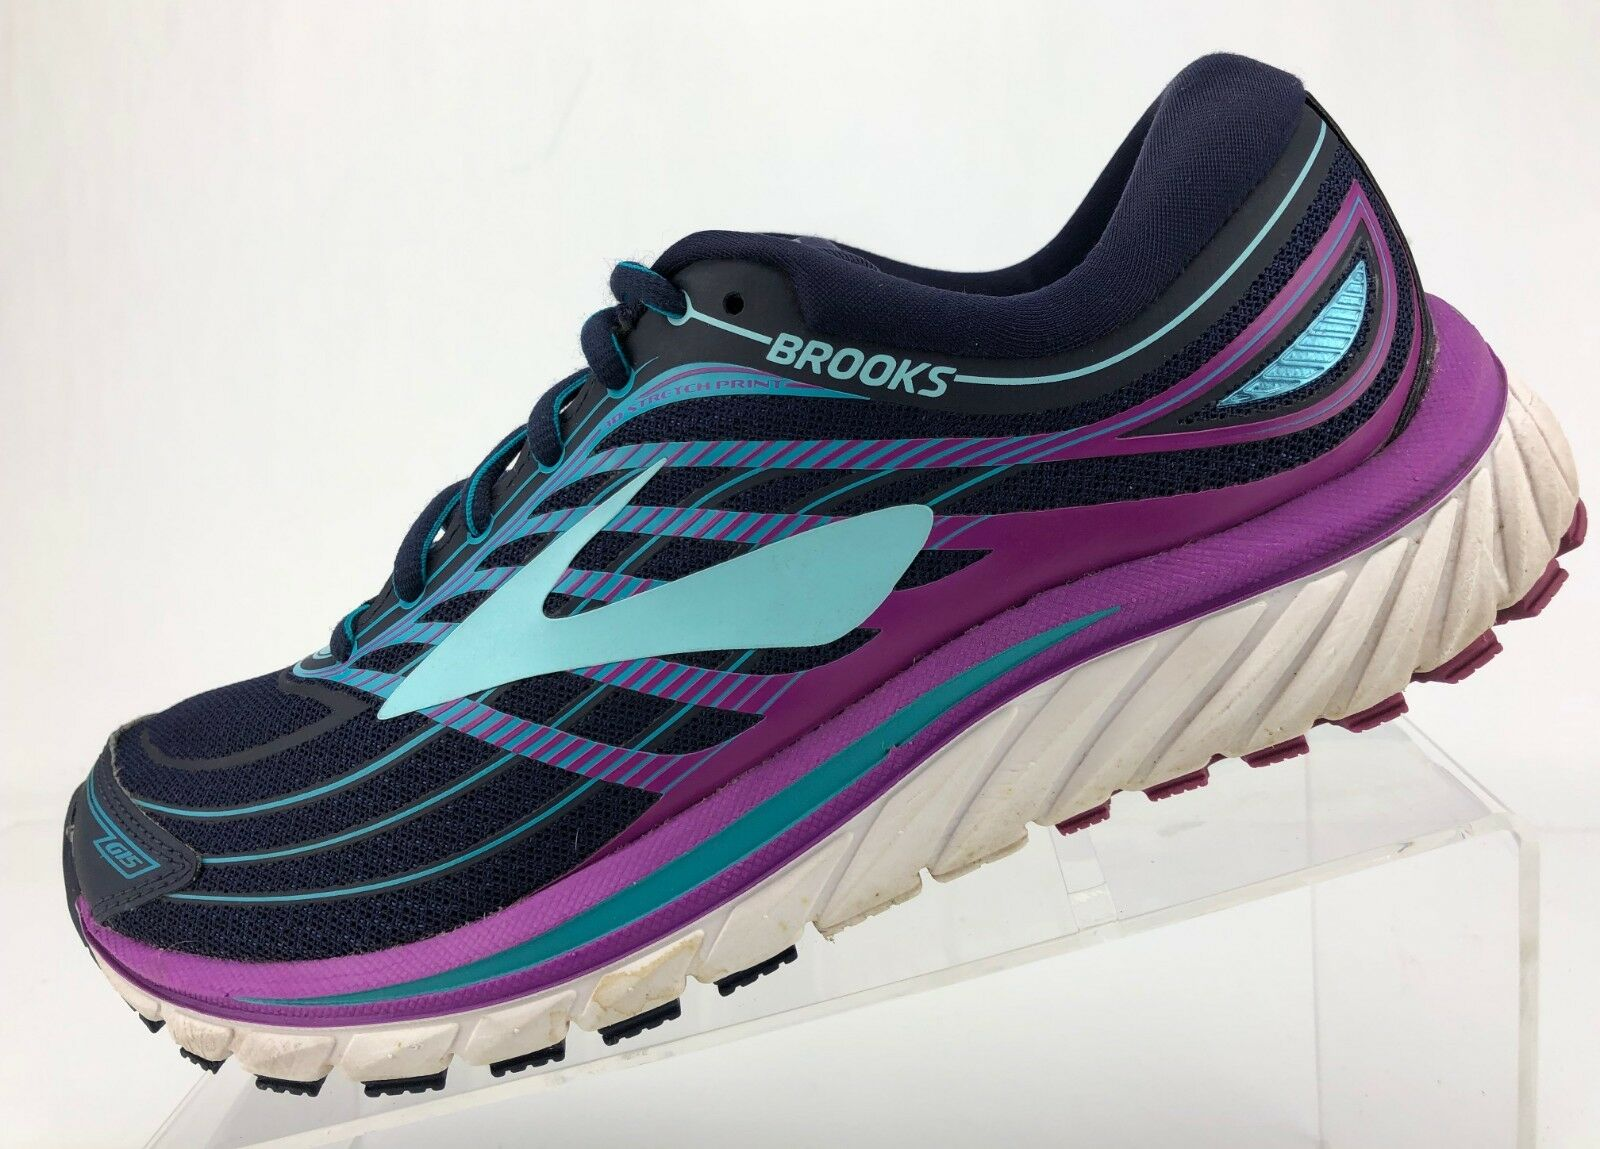 Brooks Glycerin 15 Road Running schuhe Blau Cross Training Athletic damen Sz 9.5B